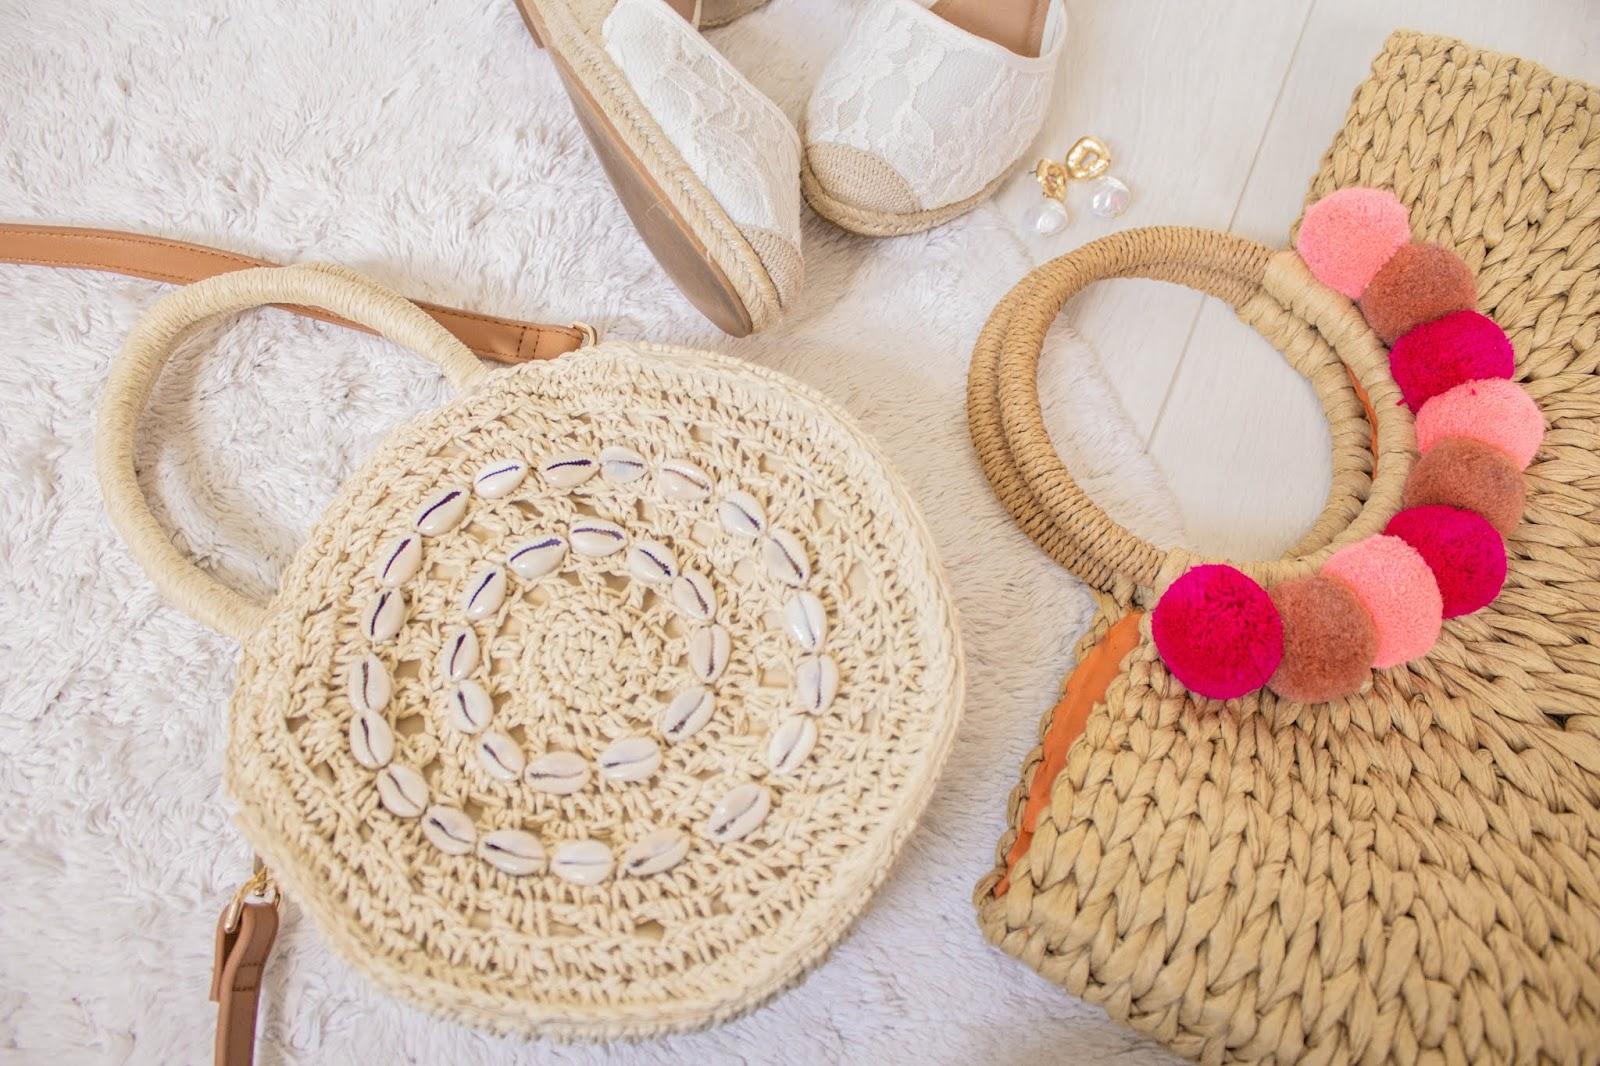 Circular straw bag with sea shell embellishment